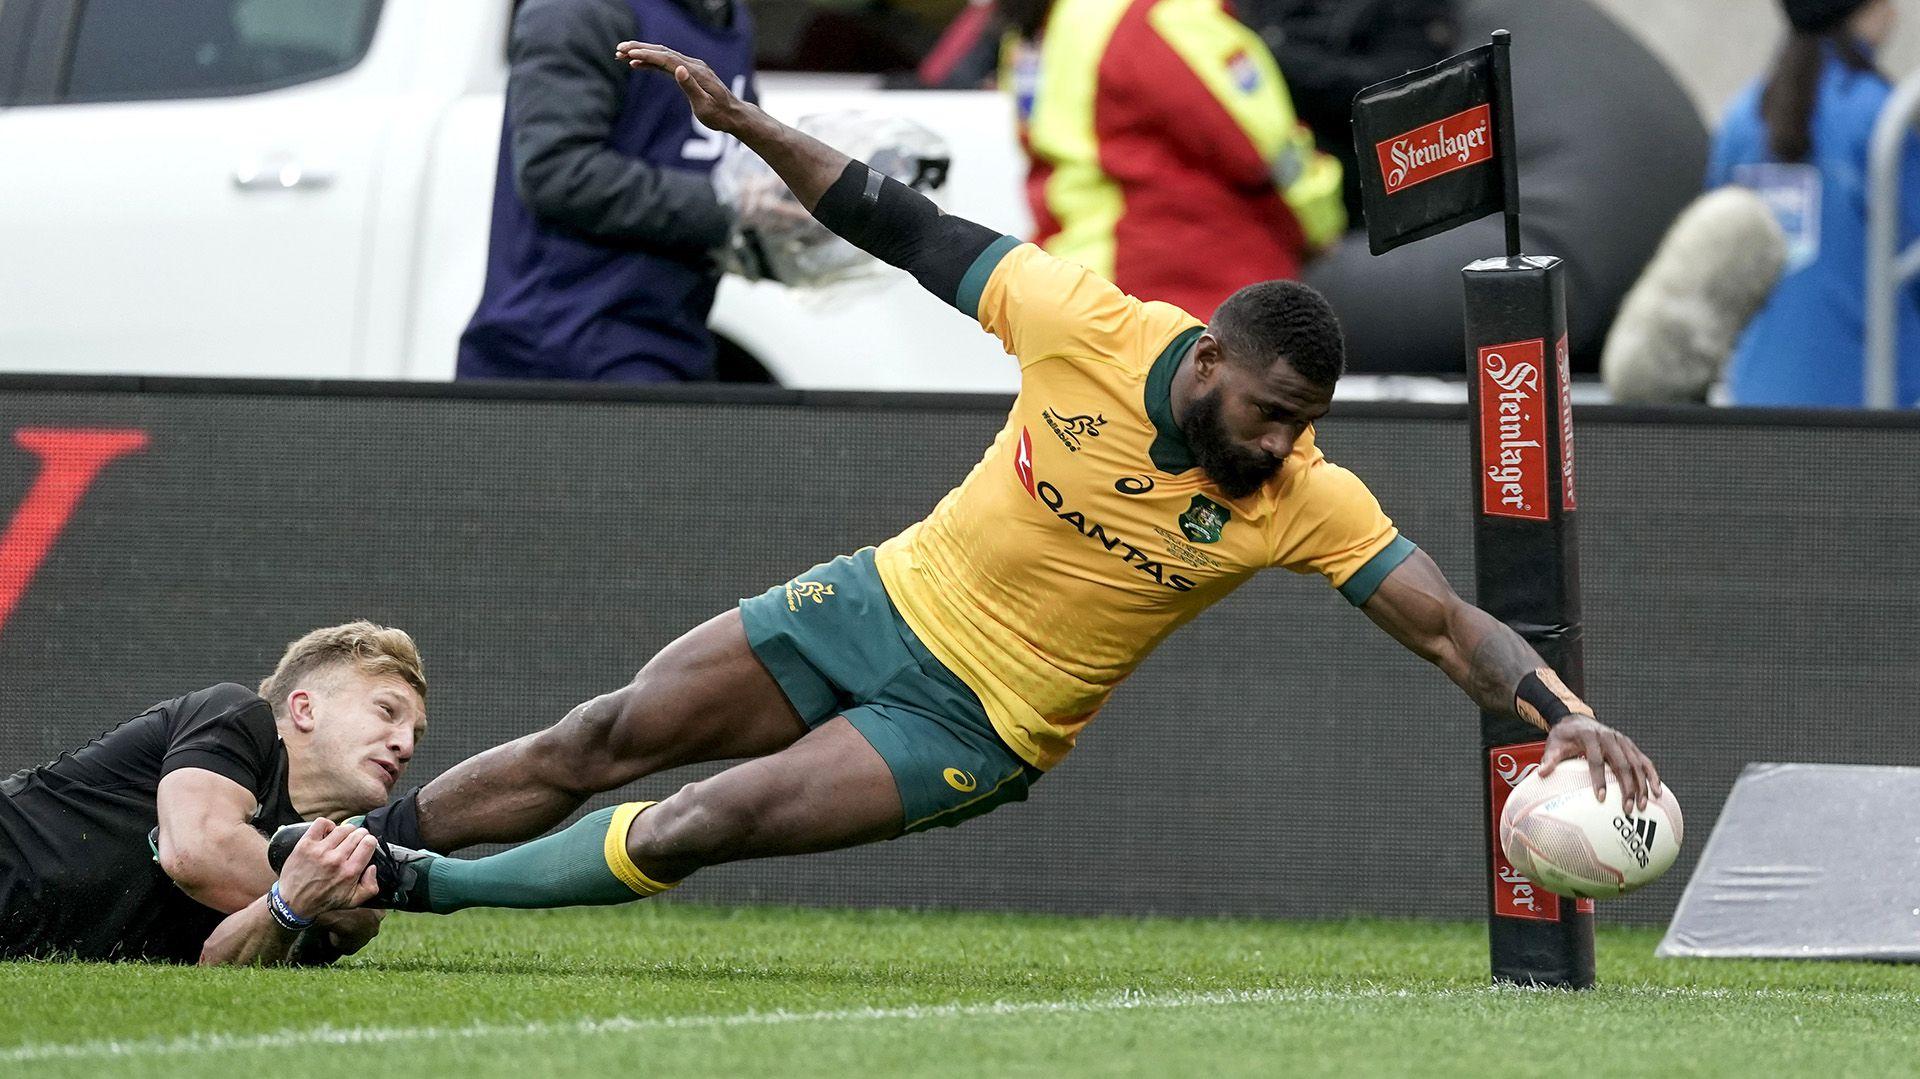 Nueva Zelanda vs Australia - Copa Bledisloe Rugby